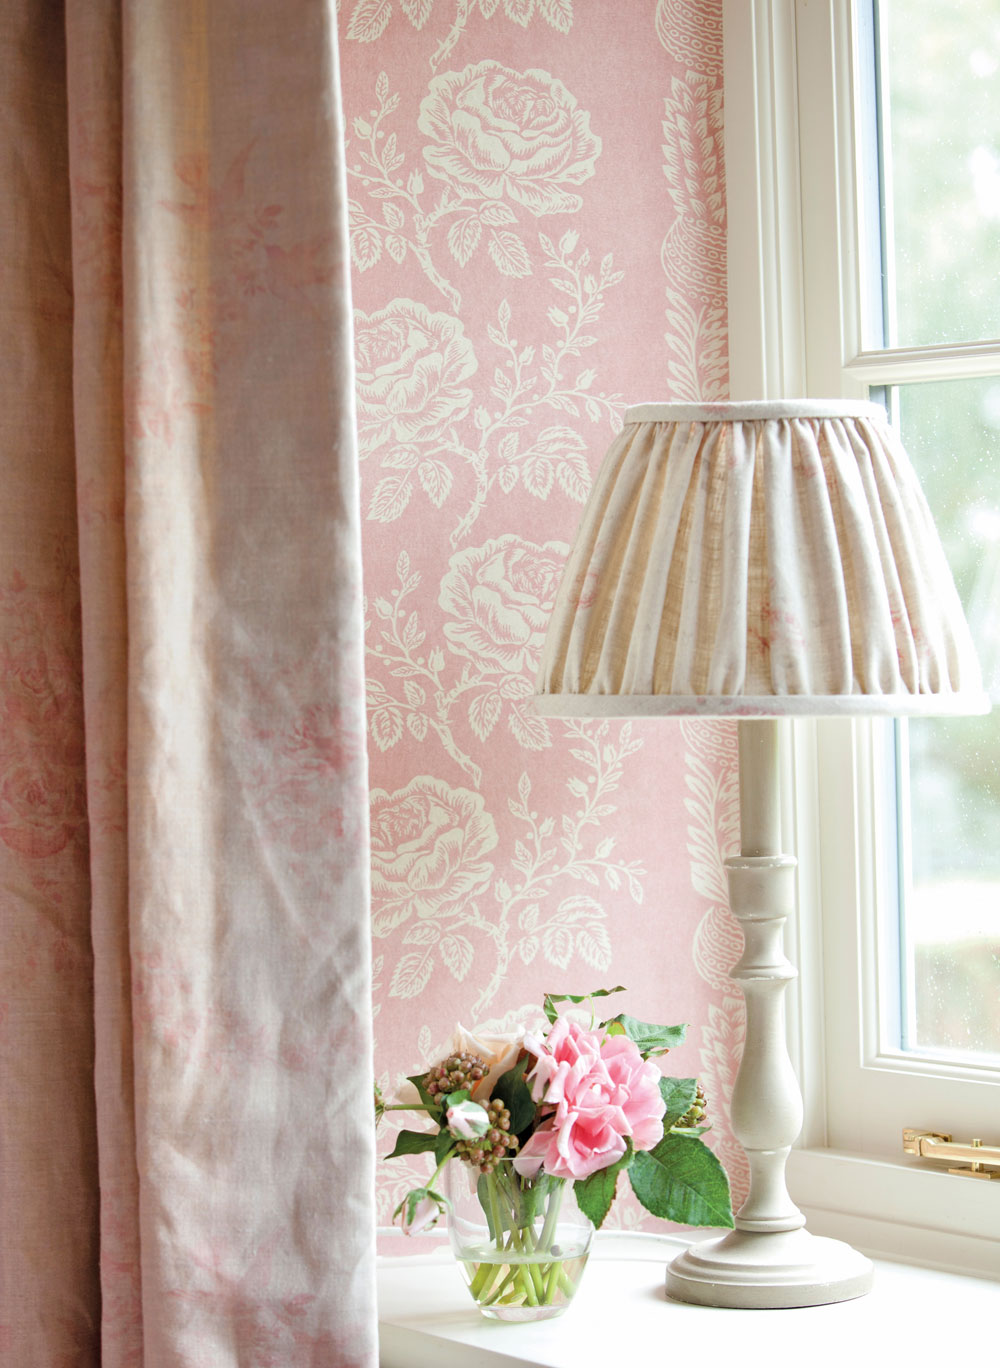 delilah-wallpaper-close-up